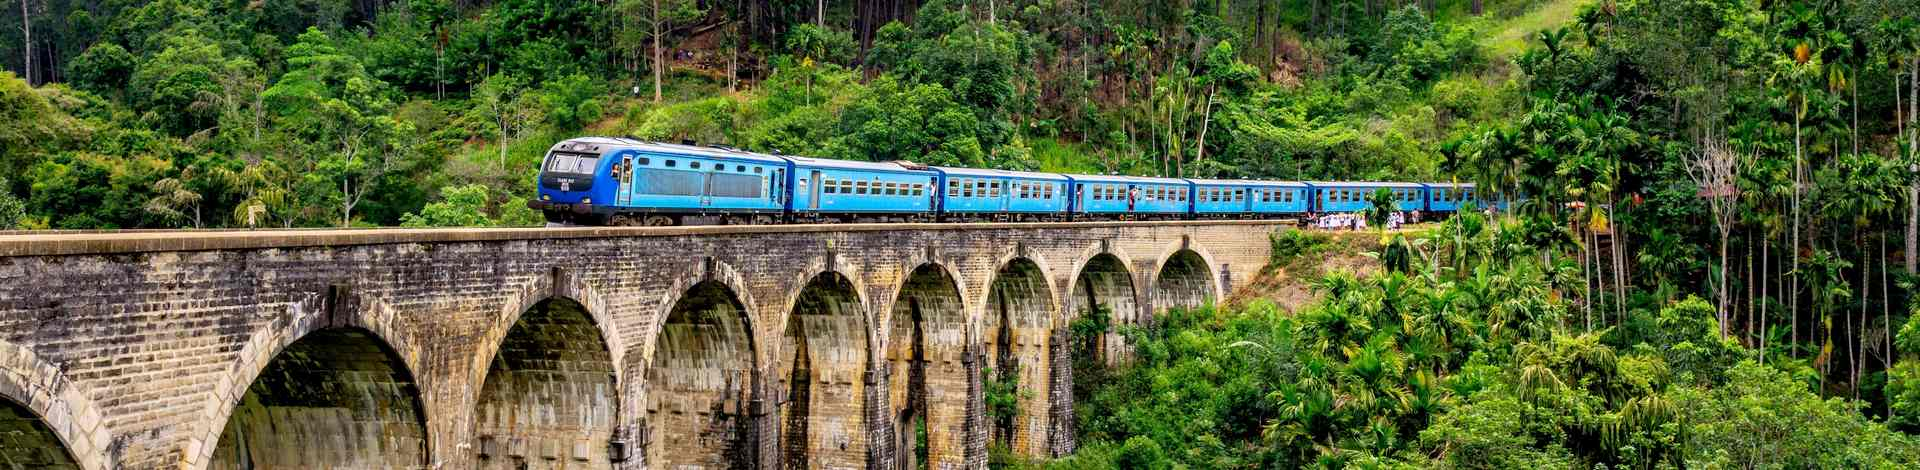 Train local Sri Lanka végétation Nuwara Eliya Ella